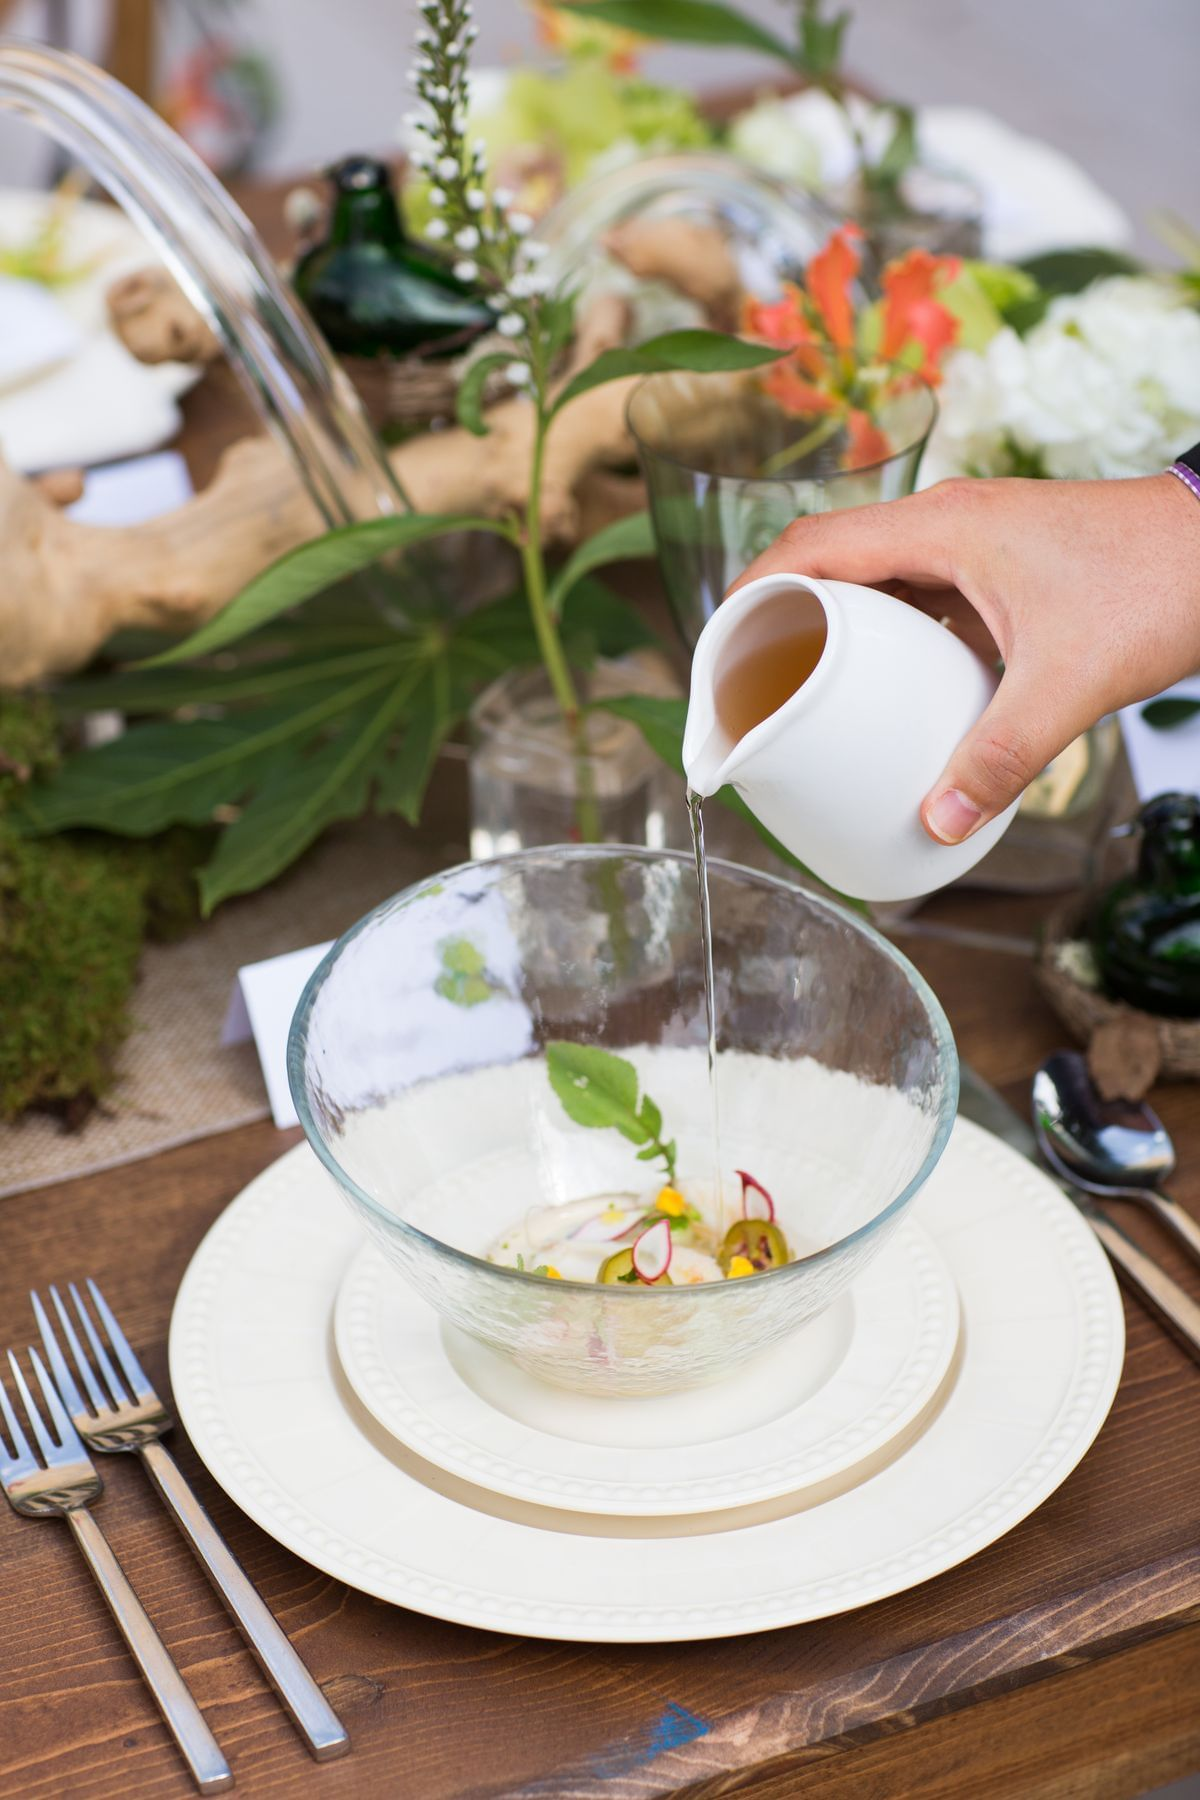 pouring liquid onto fancy dish